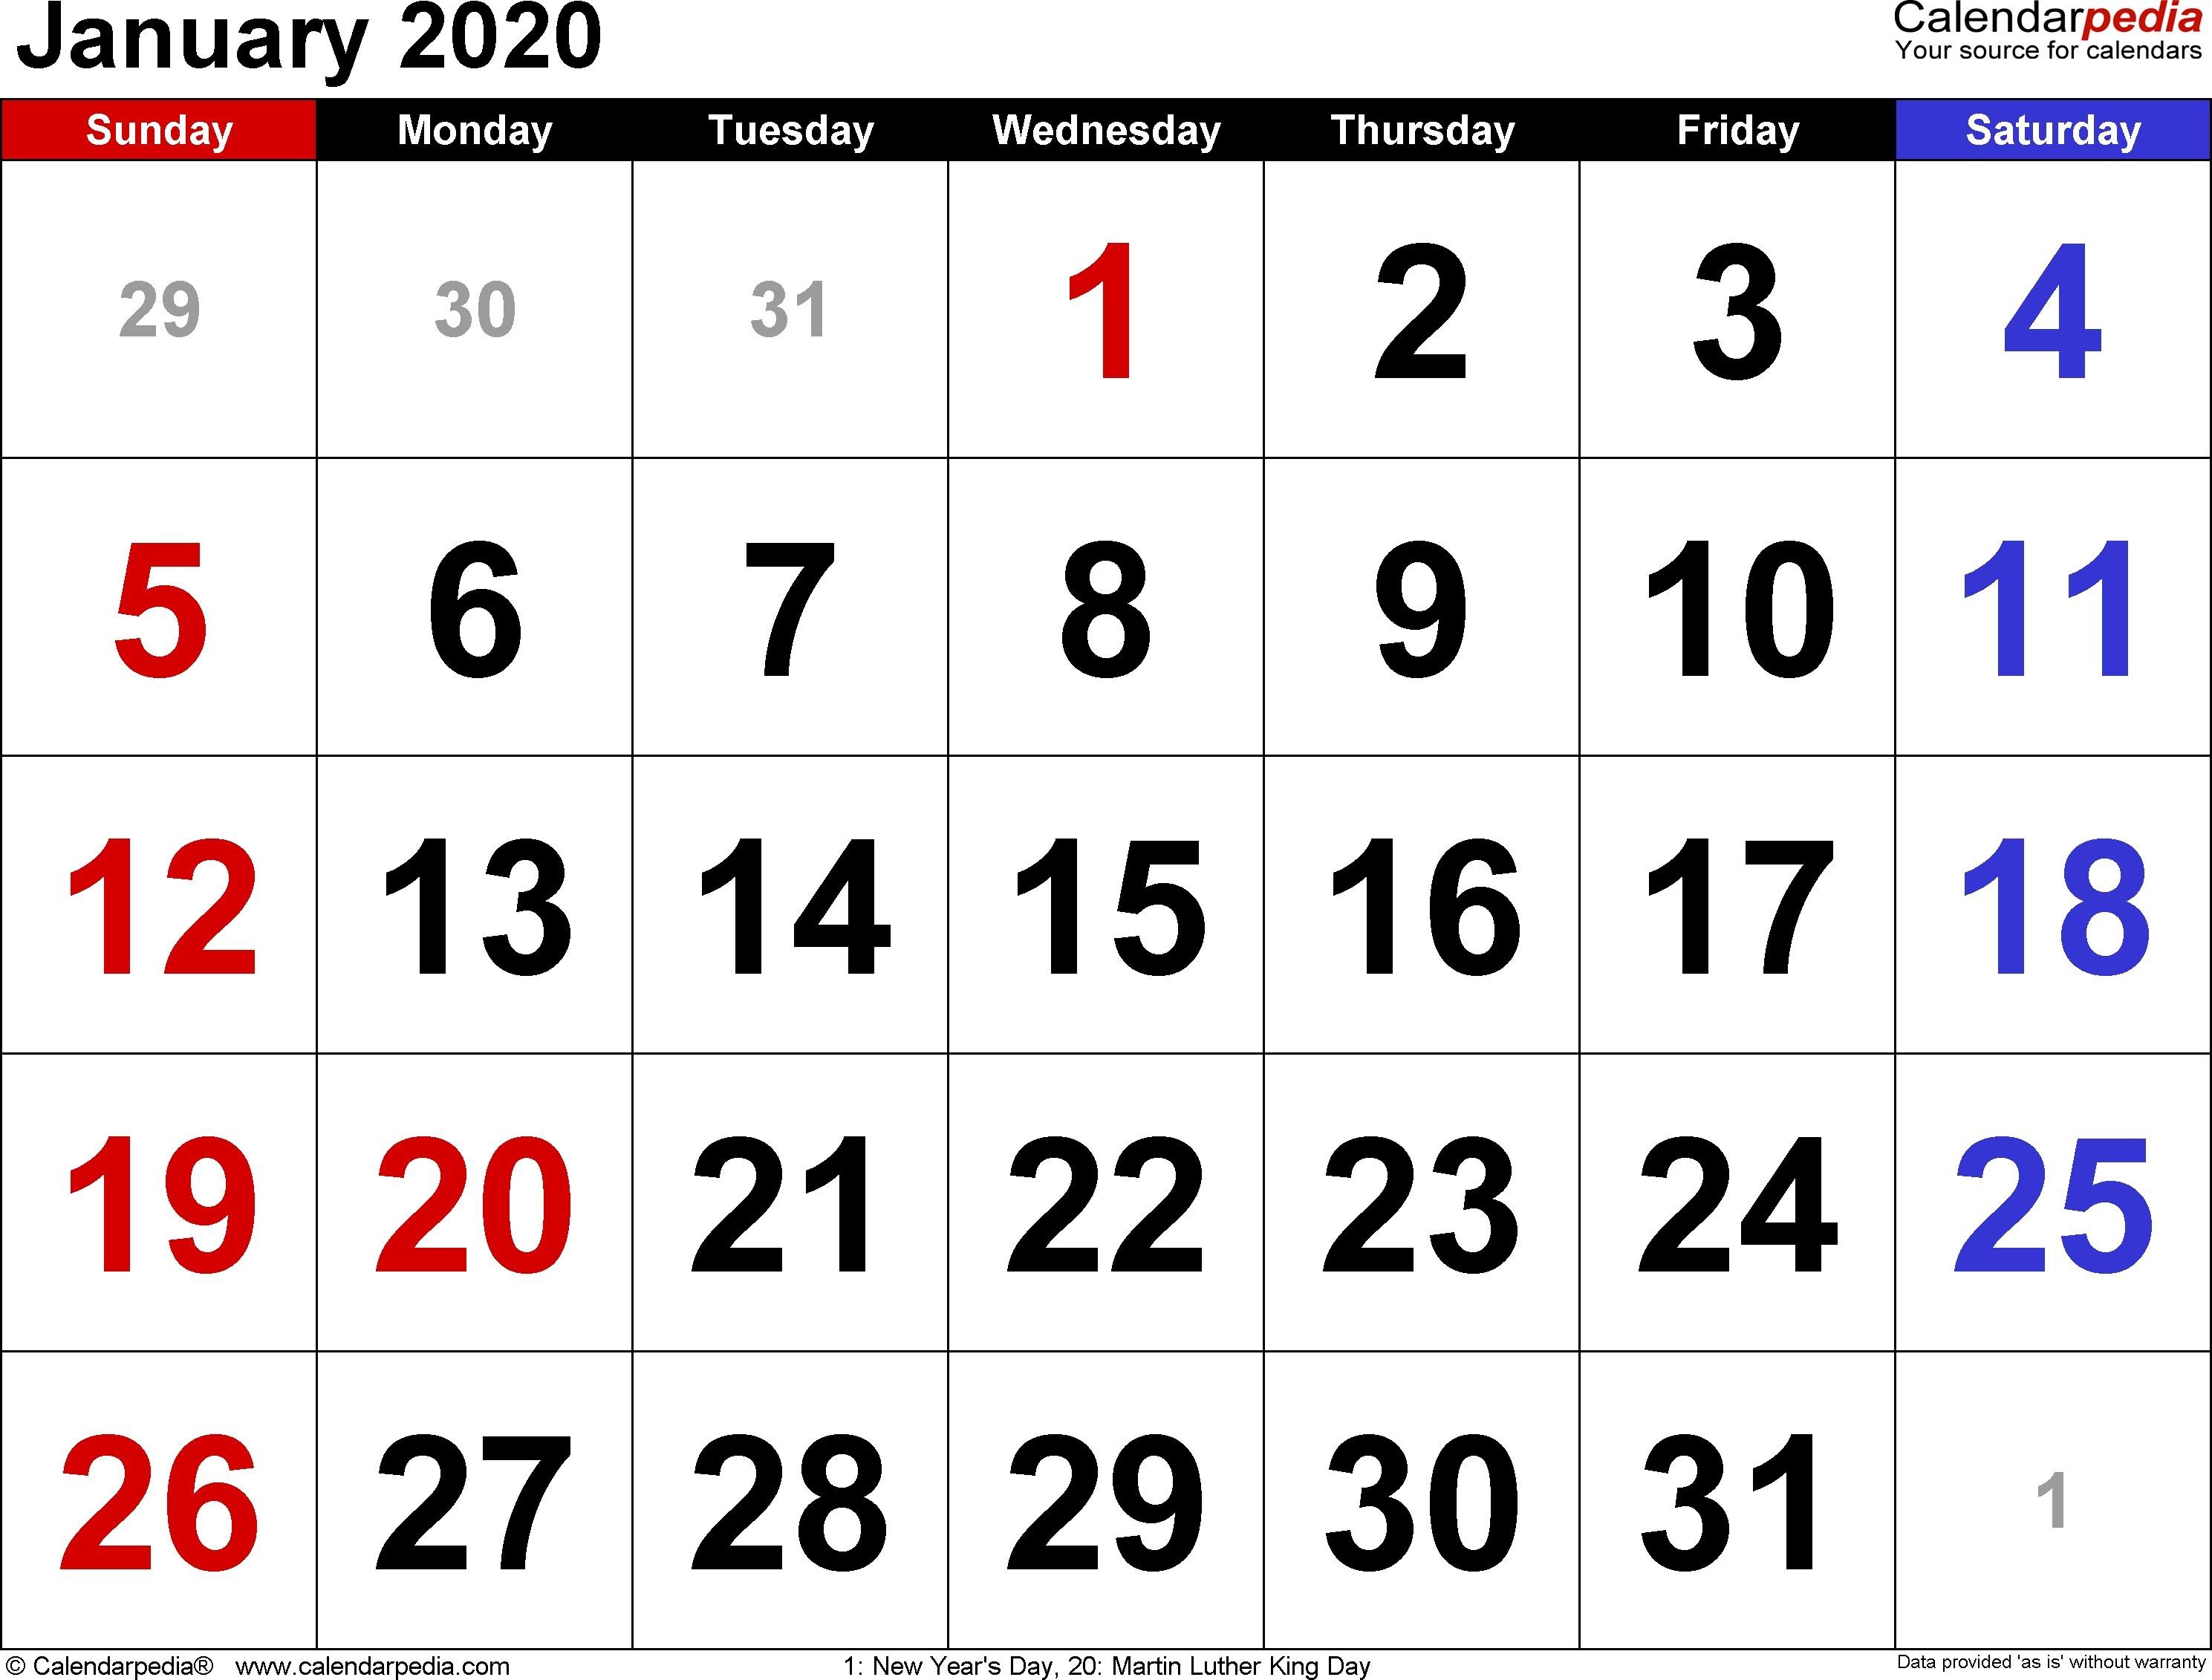 Tamil Calendar January 2020 | Calendar Template Information intended for 2020 Tamil Calendar January